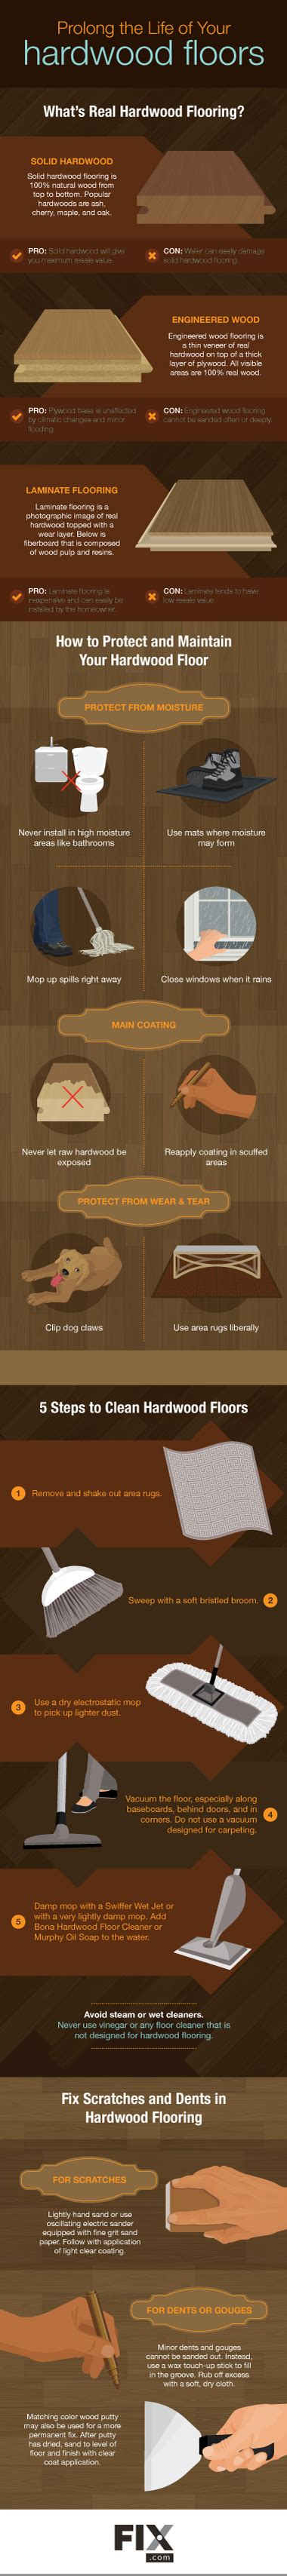 protecting hardwood floors how to protect your hardwood floors fix